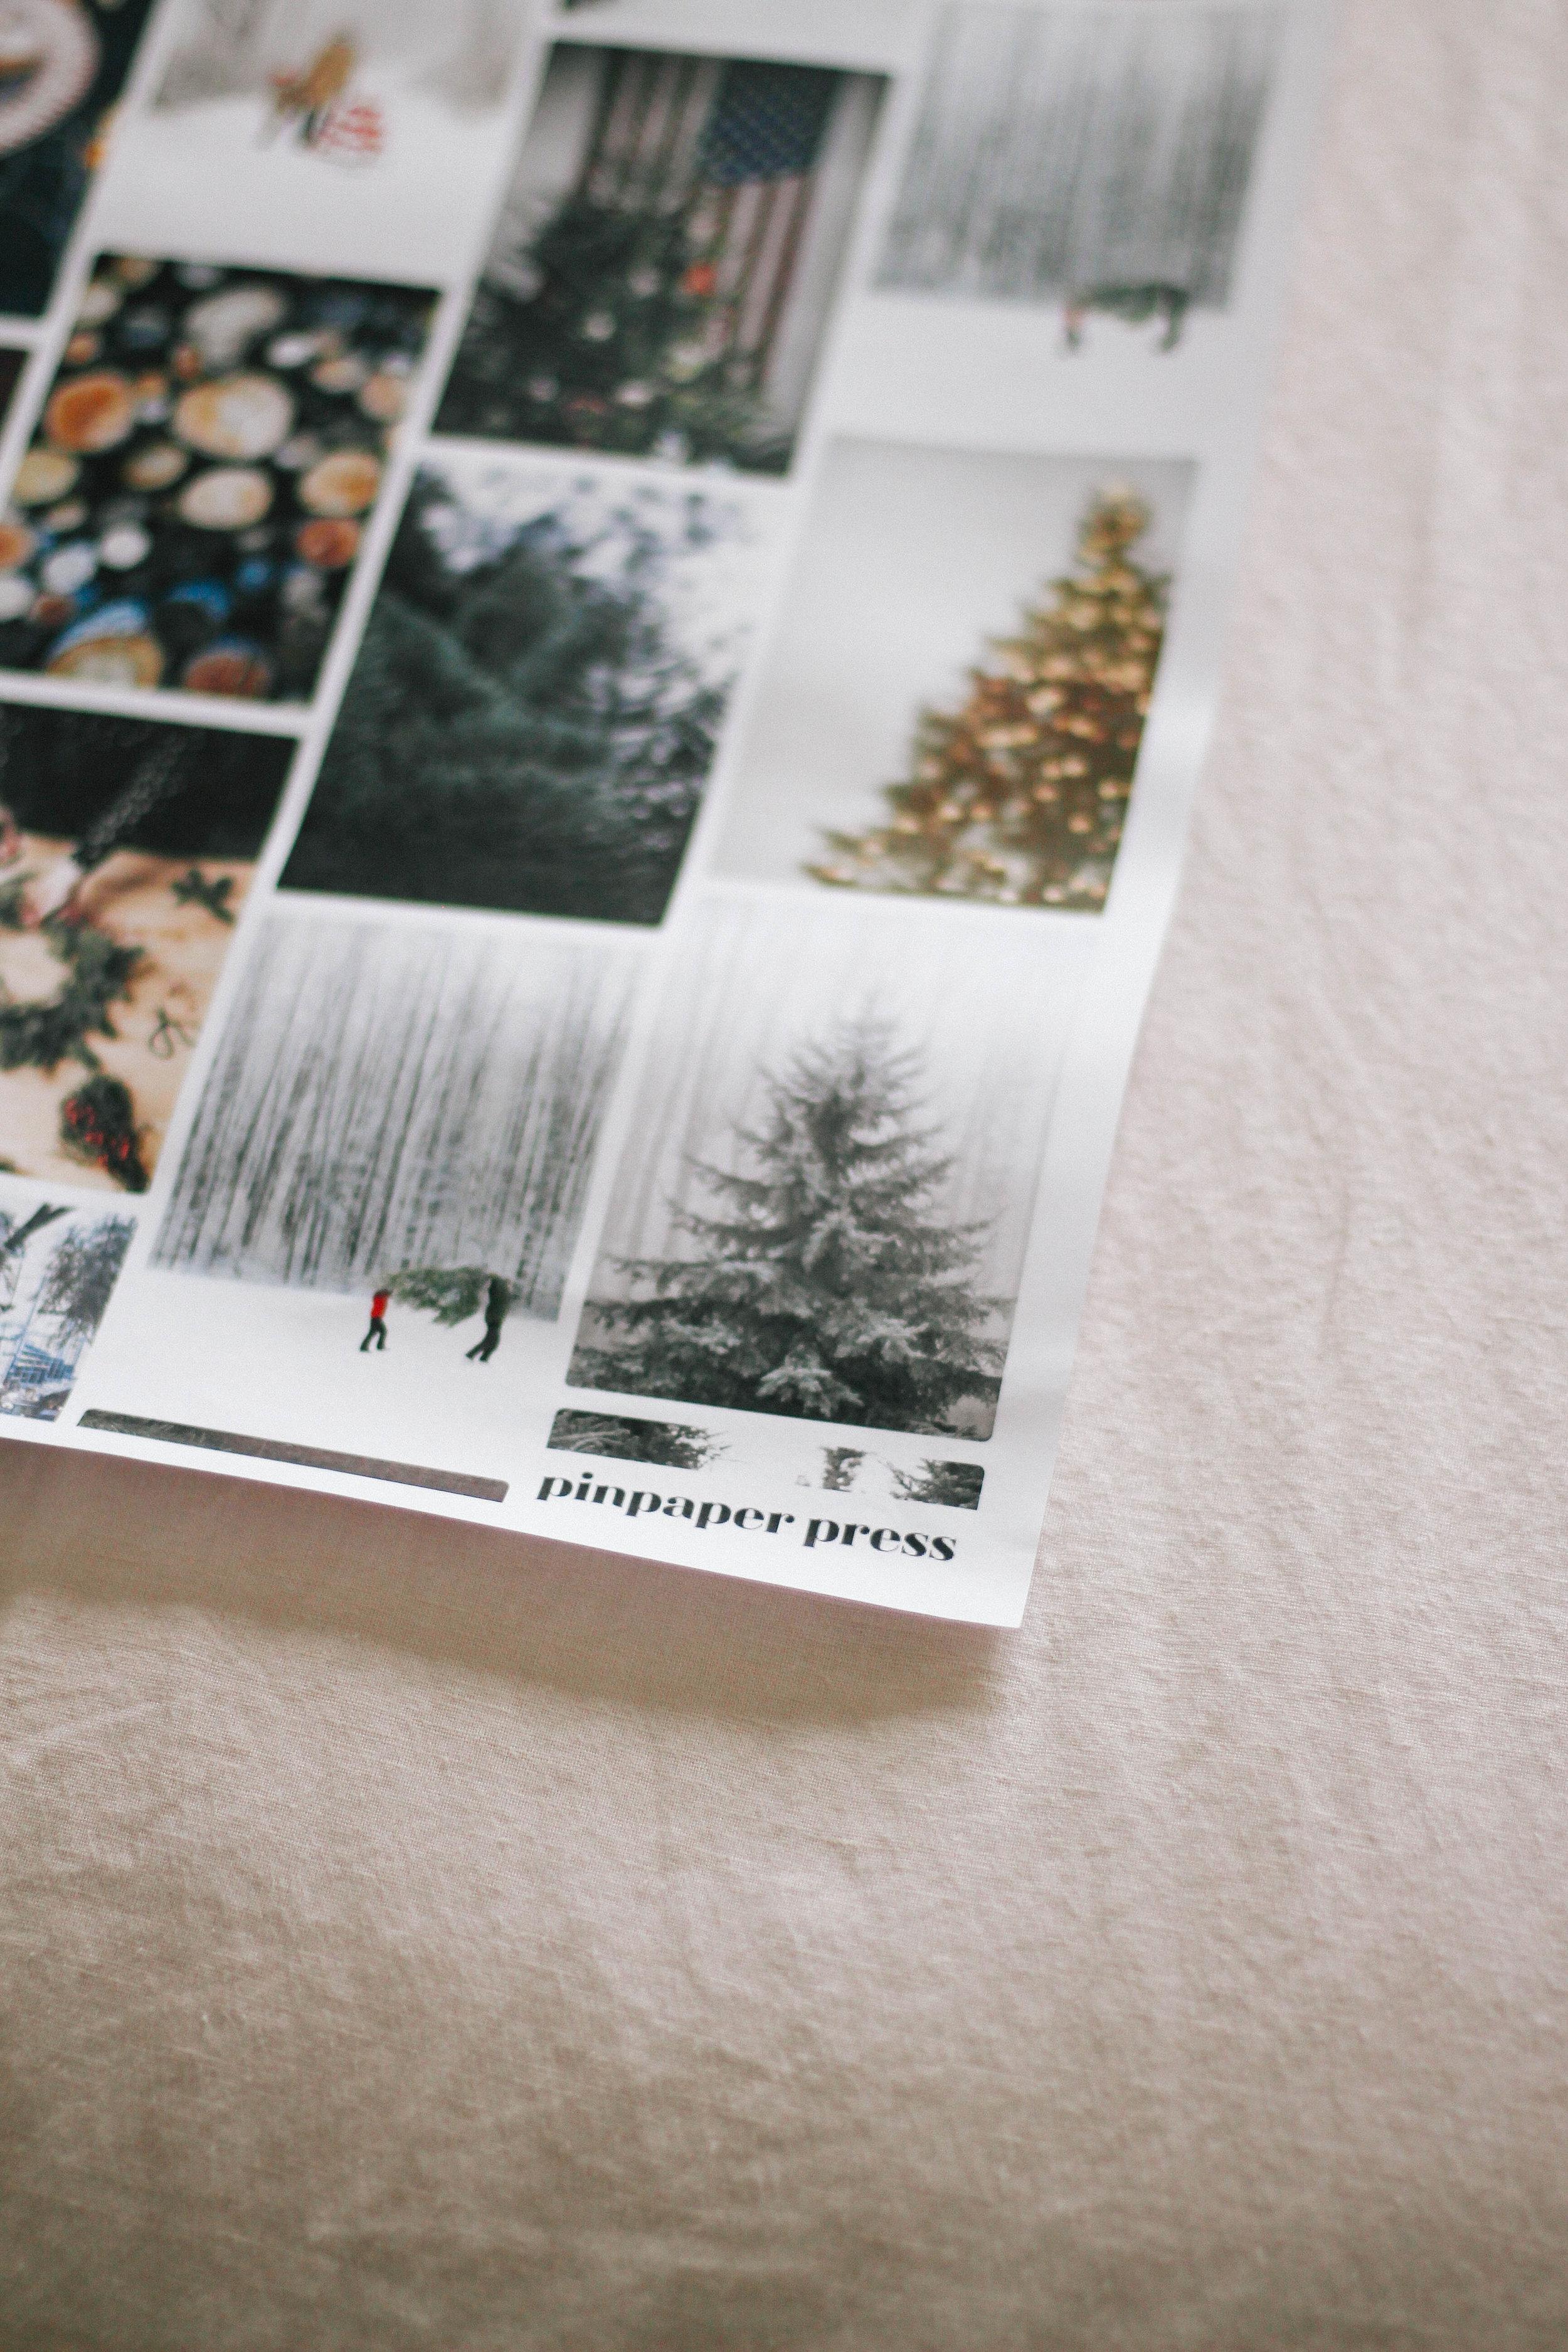 pinpaper press-5.jpg